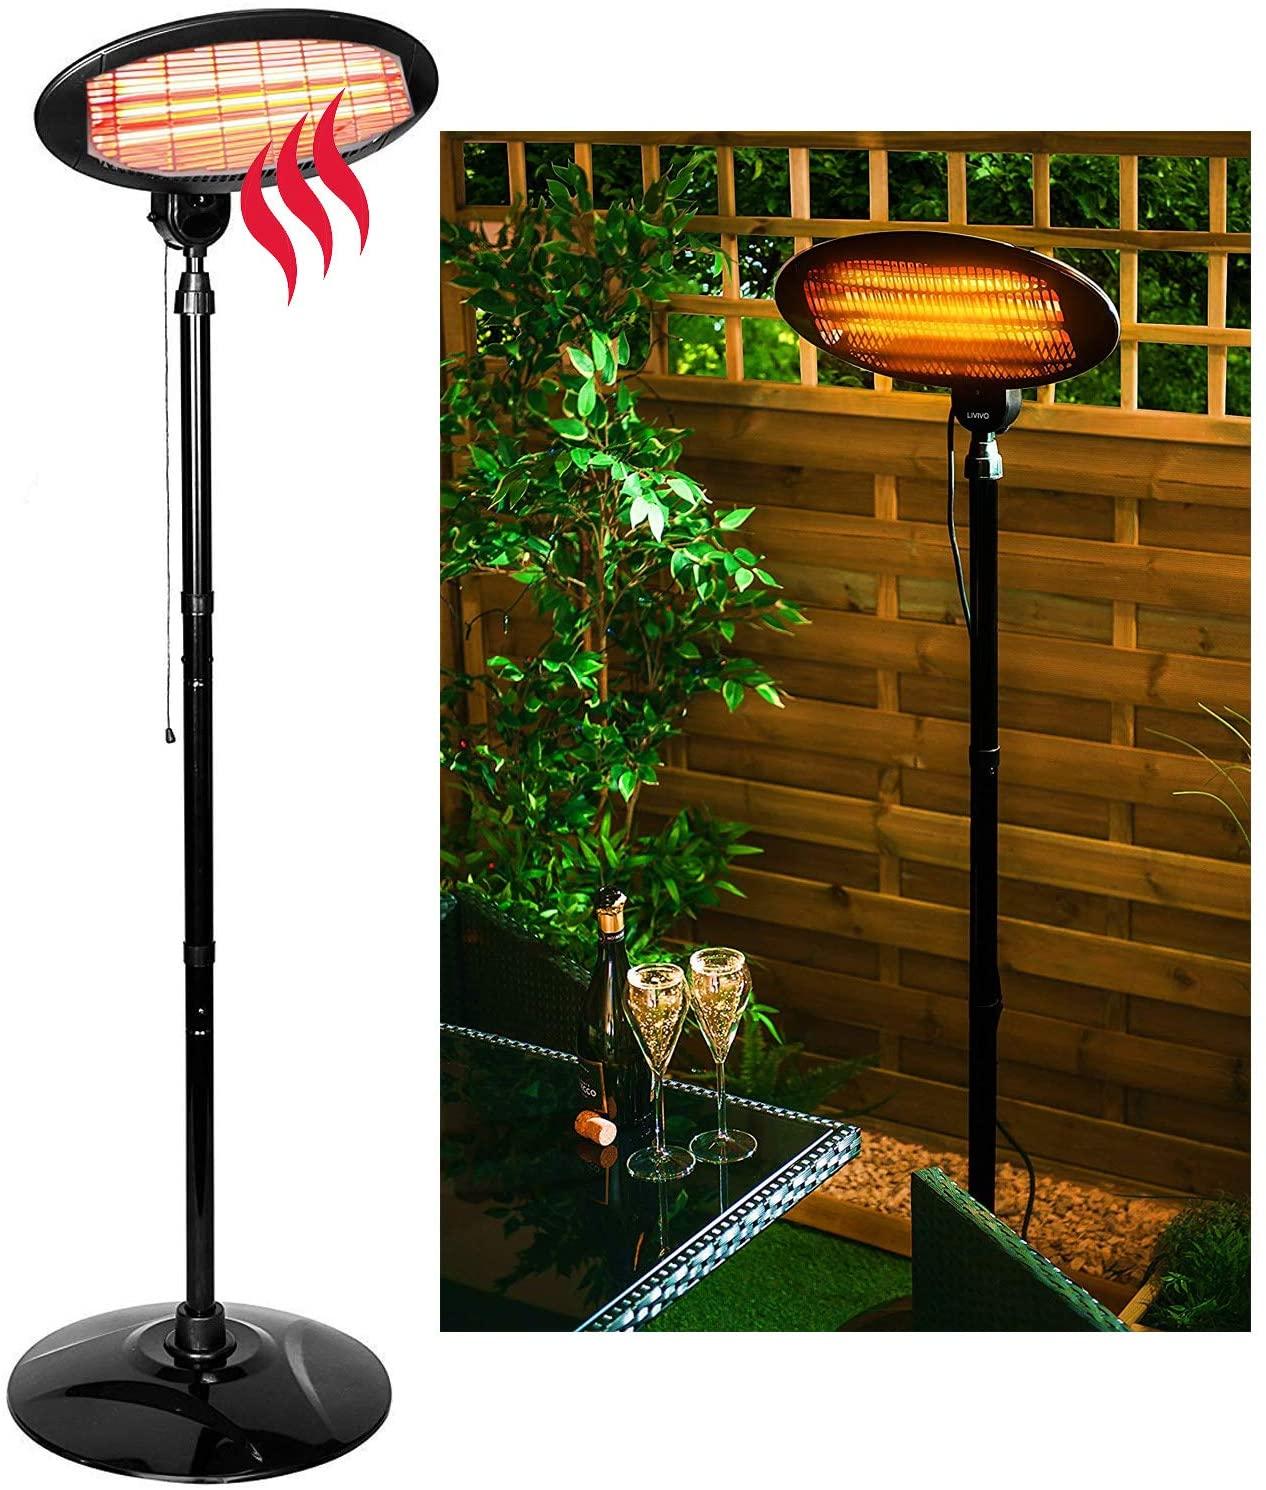 details about 2kw free standing electric patio heater garden outdoor waterproof quartz 2000w